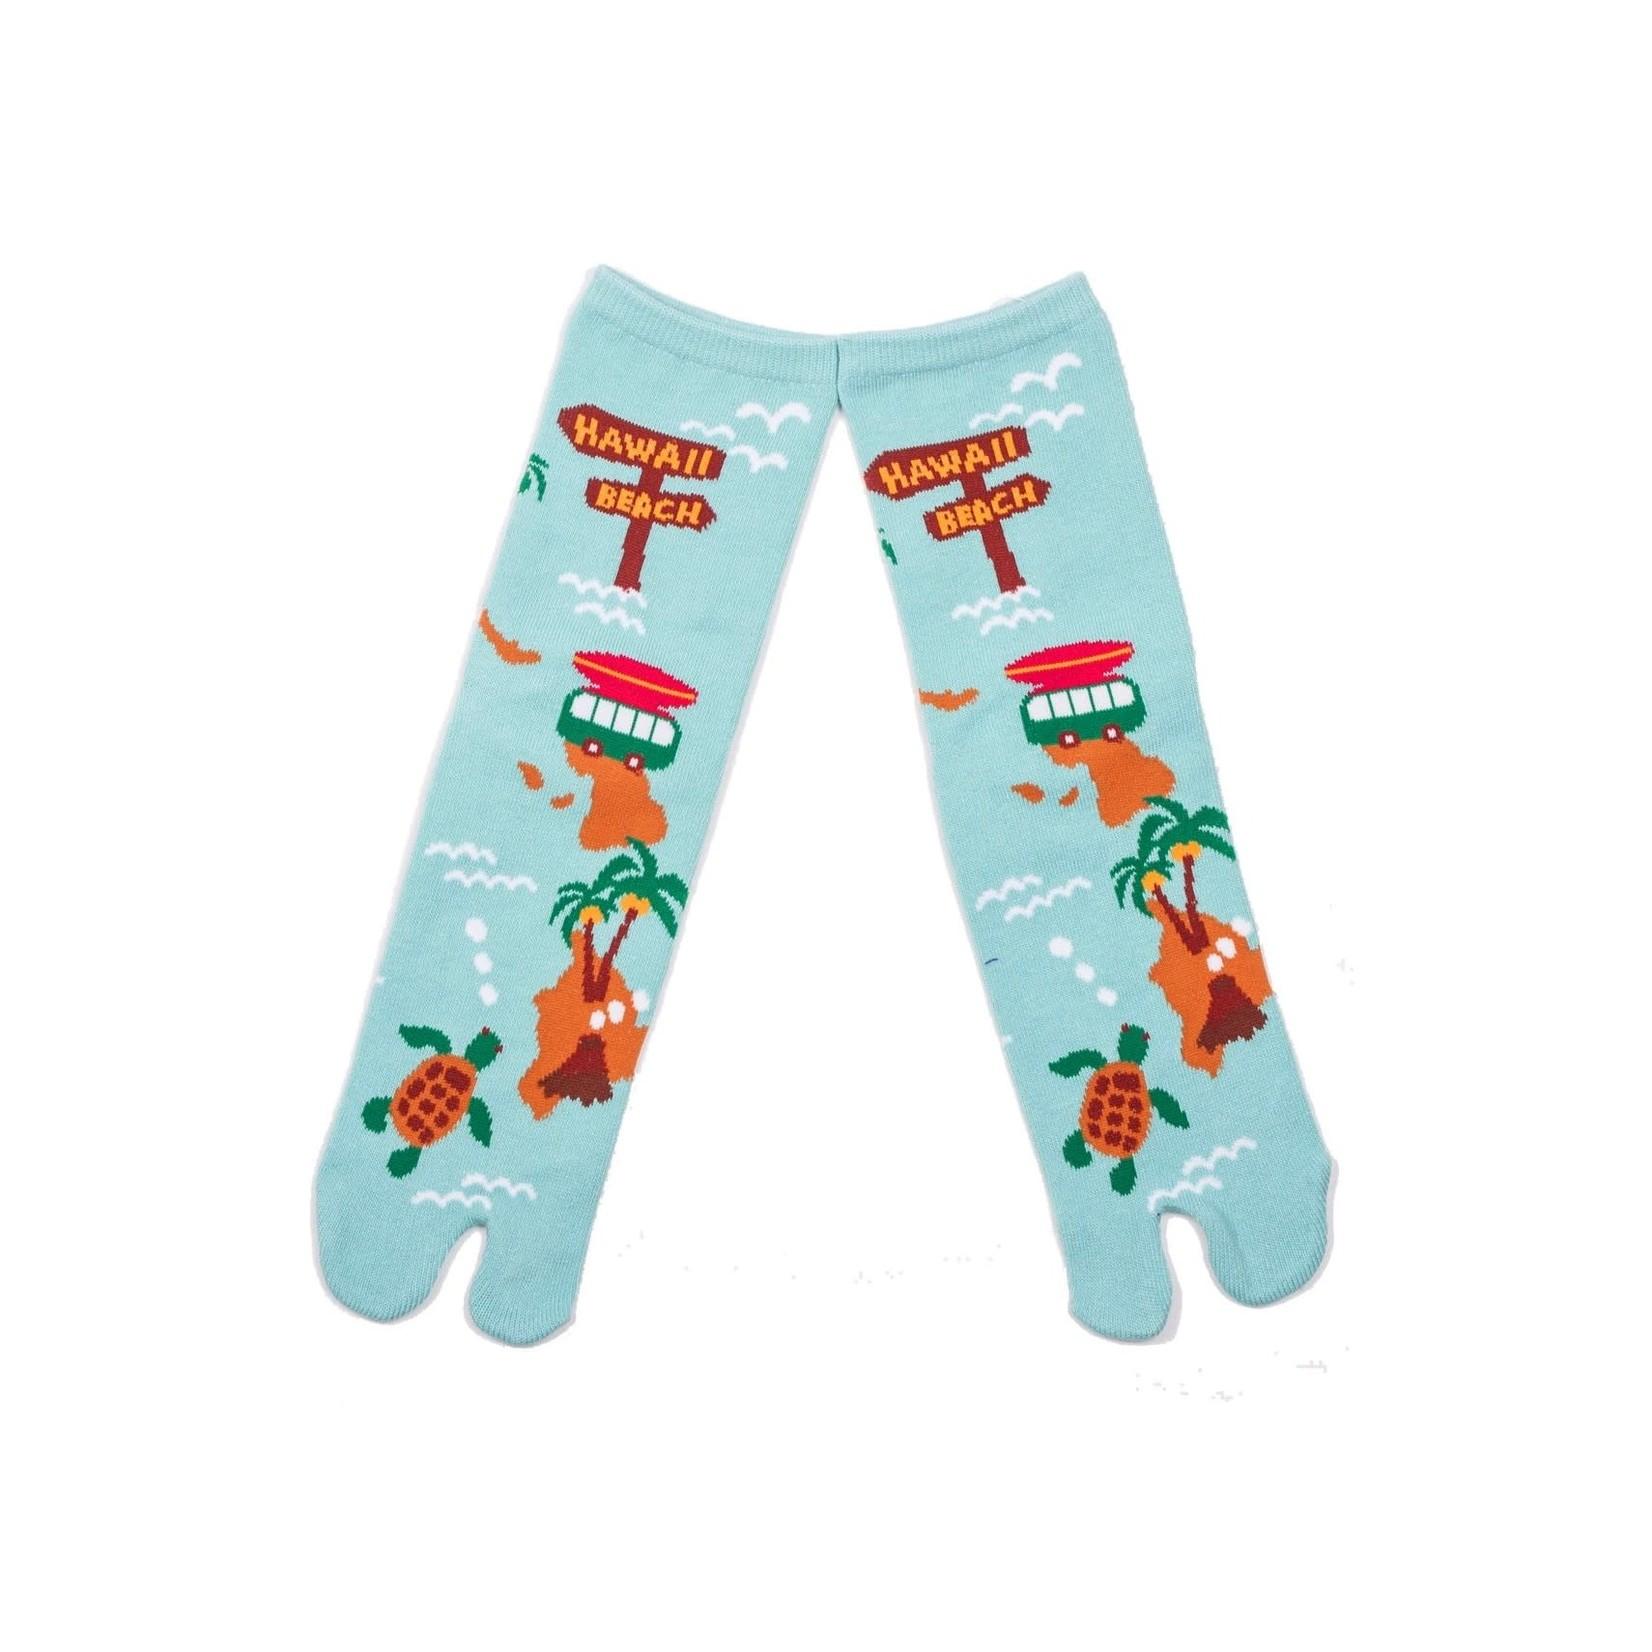 Ninja Socks/Socks Up